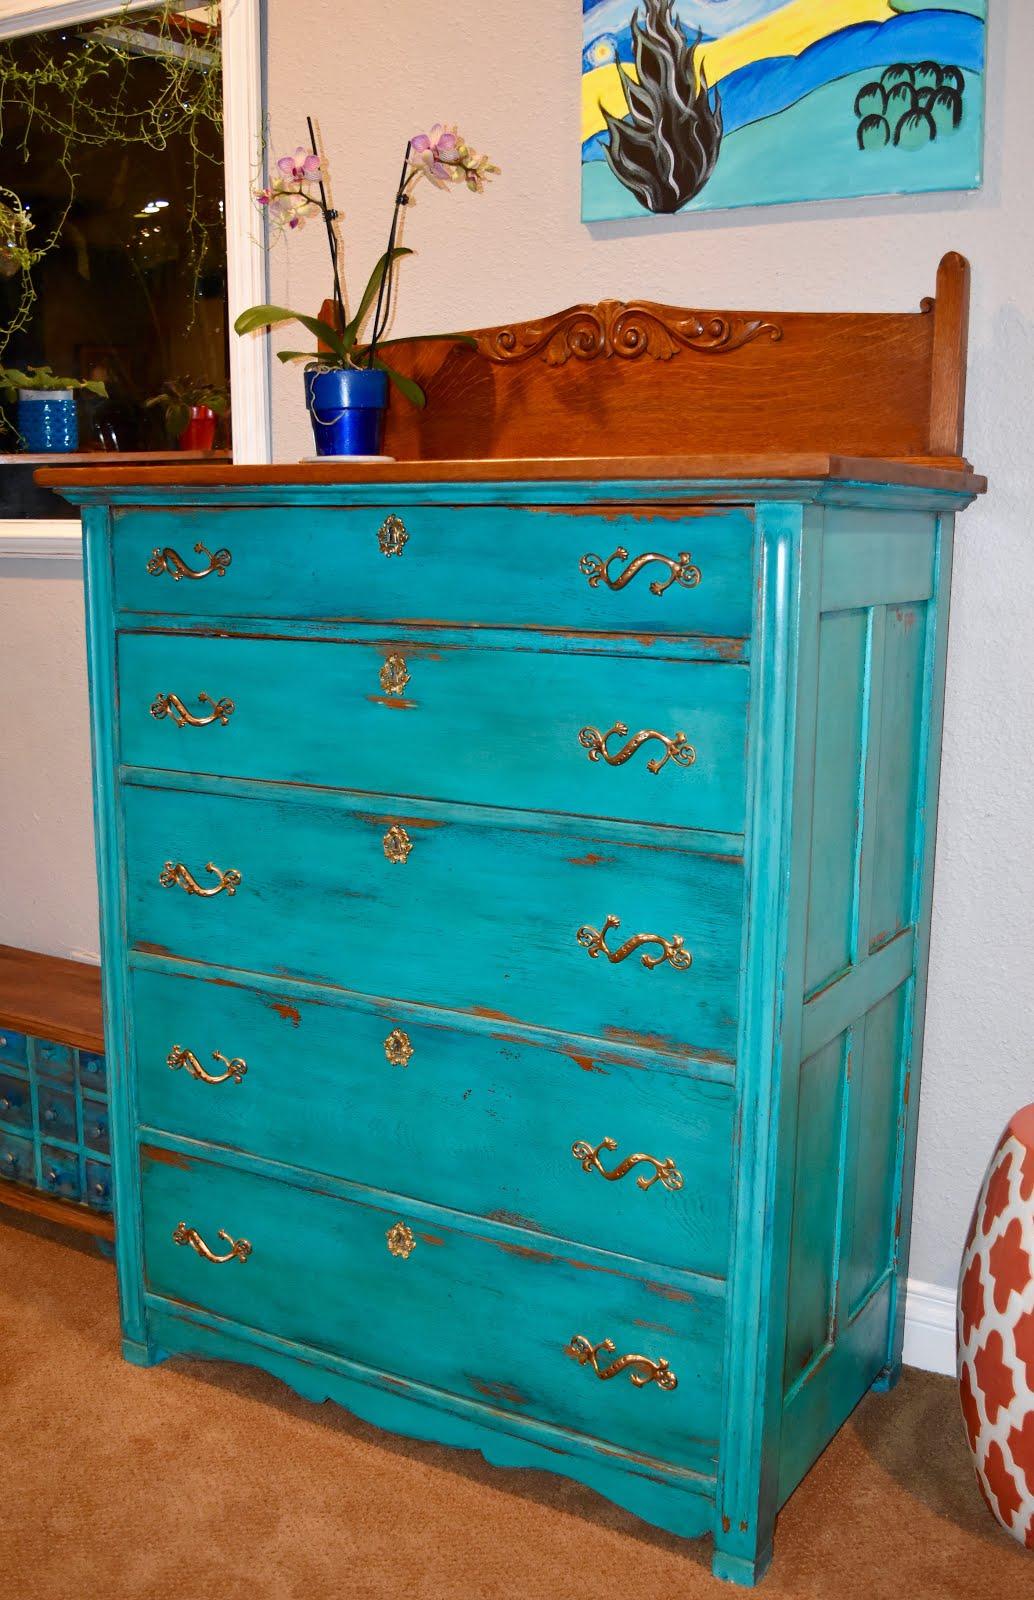 Makemeprettyagain Antique Tall Dresser In That Gorgeous